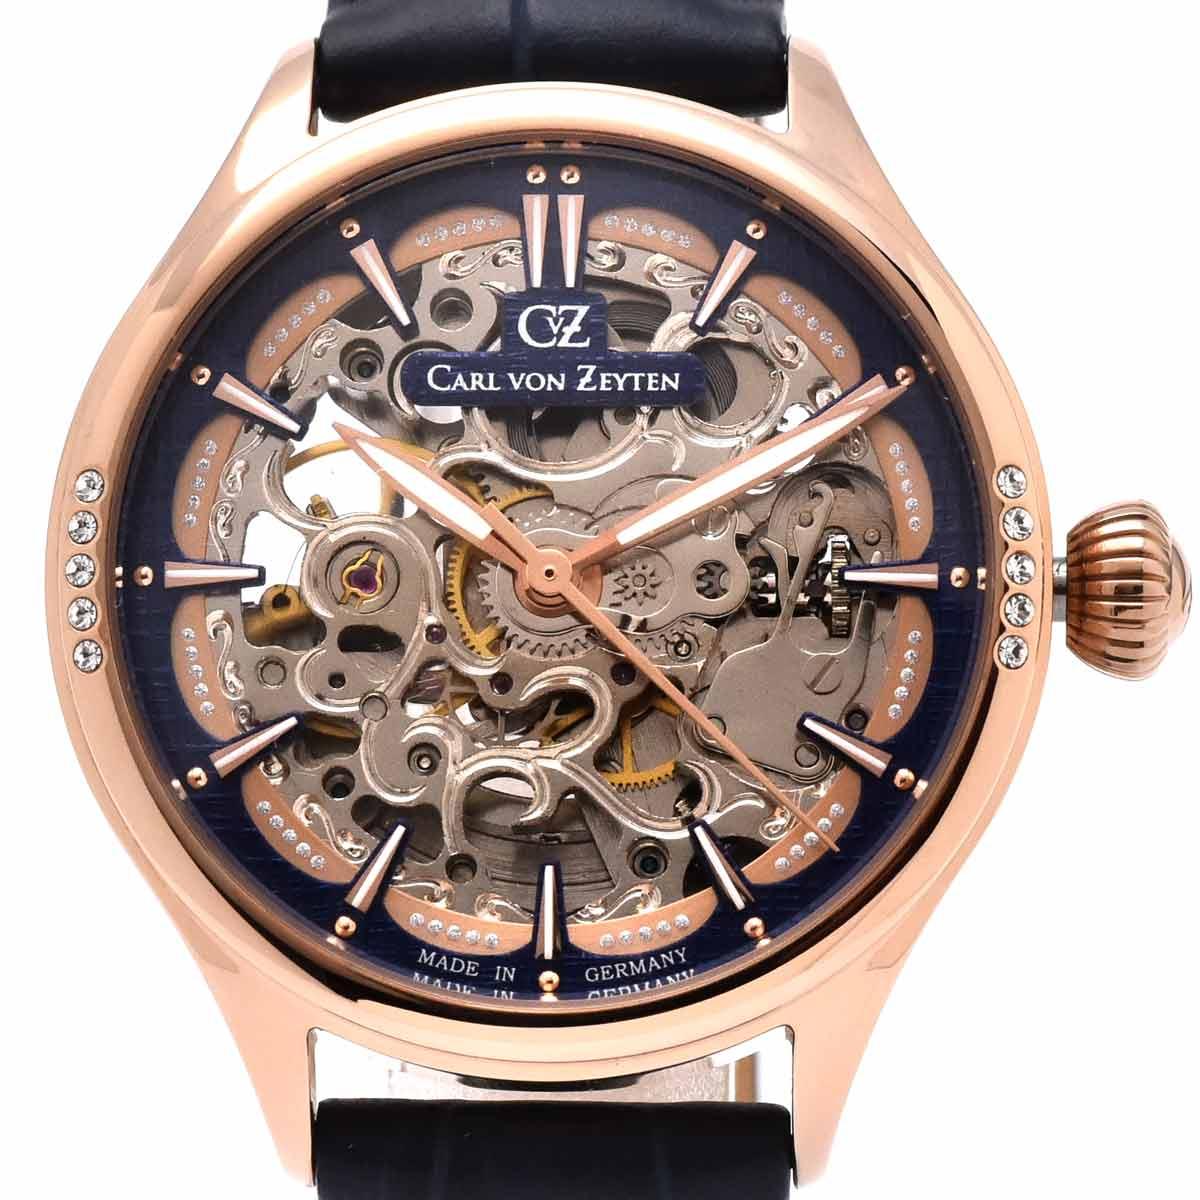 Carl von Zeyten カール・フォン・ツォイテン 自動巻き(手巻き機能あり) 腕時計 [CvZ0057RBL] 並行輸入品 スケルトン